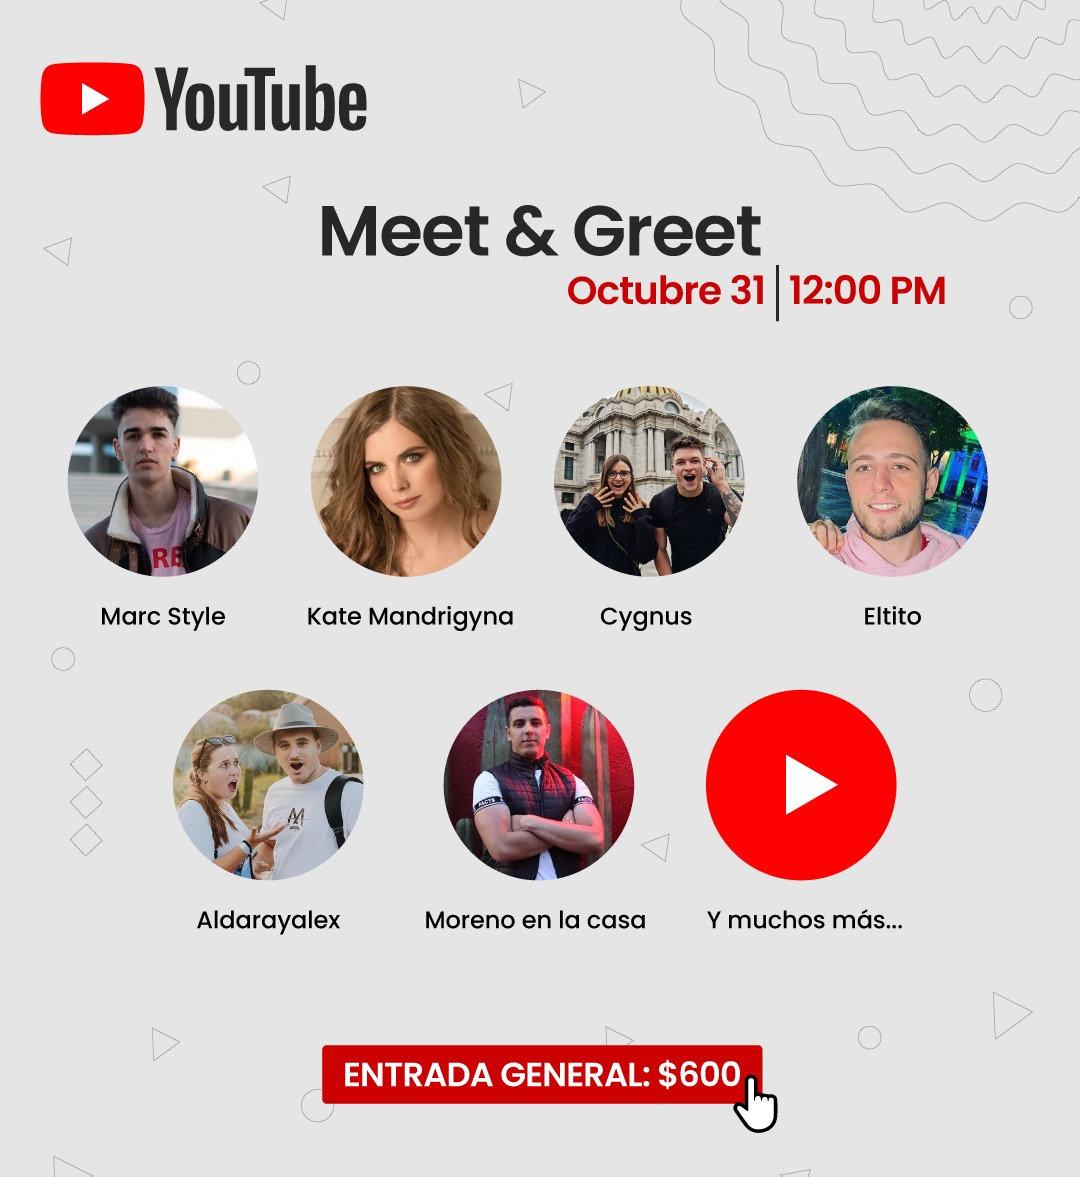 Meet & Greet con Youtubers